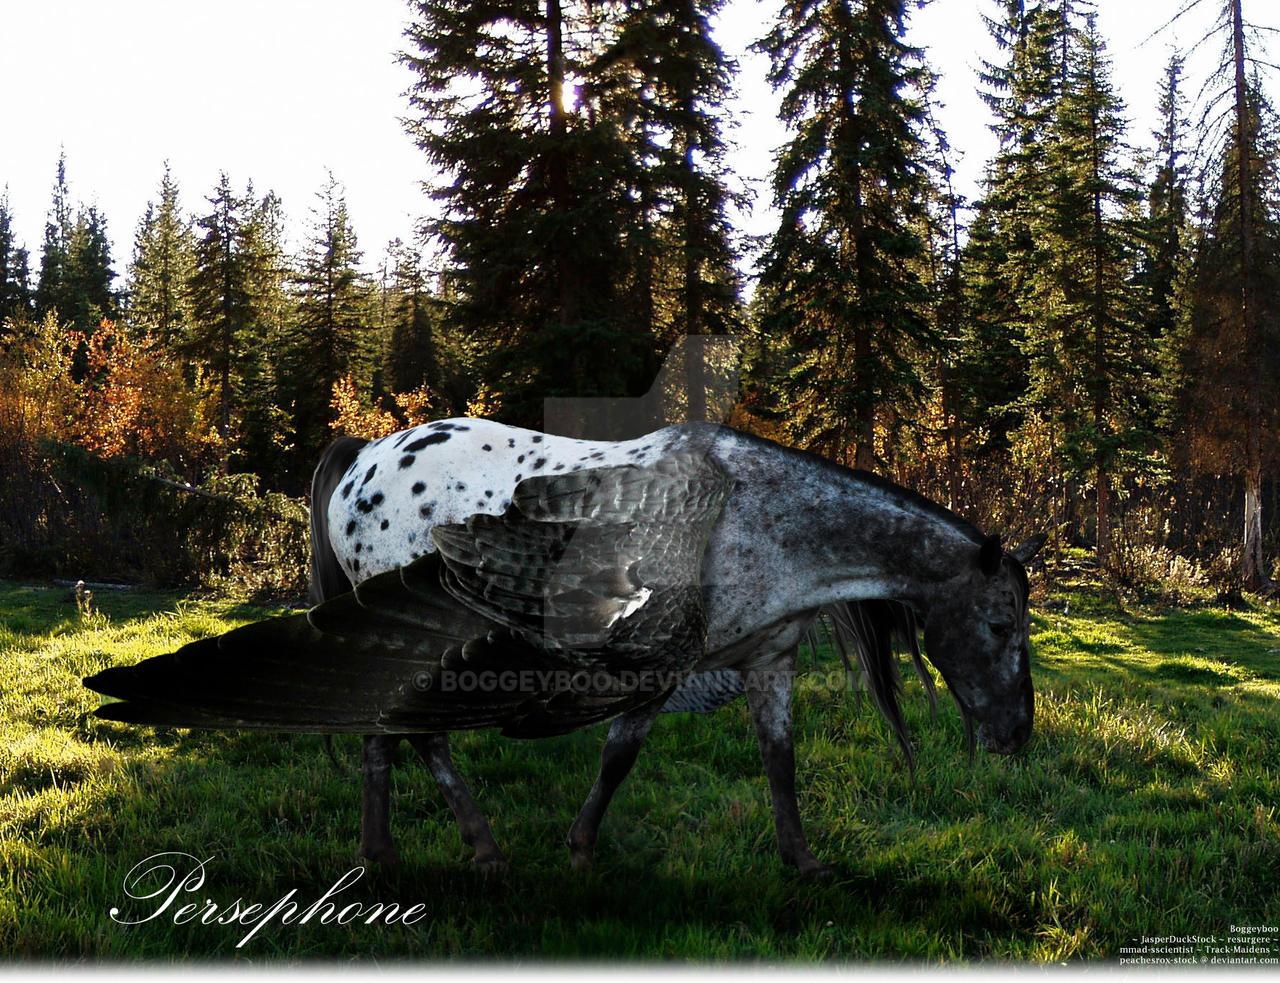 Persephone - Blue Roan Appaloosa Pegasus by Boggeyboo